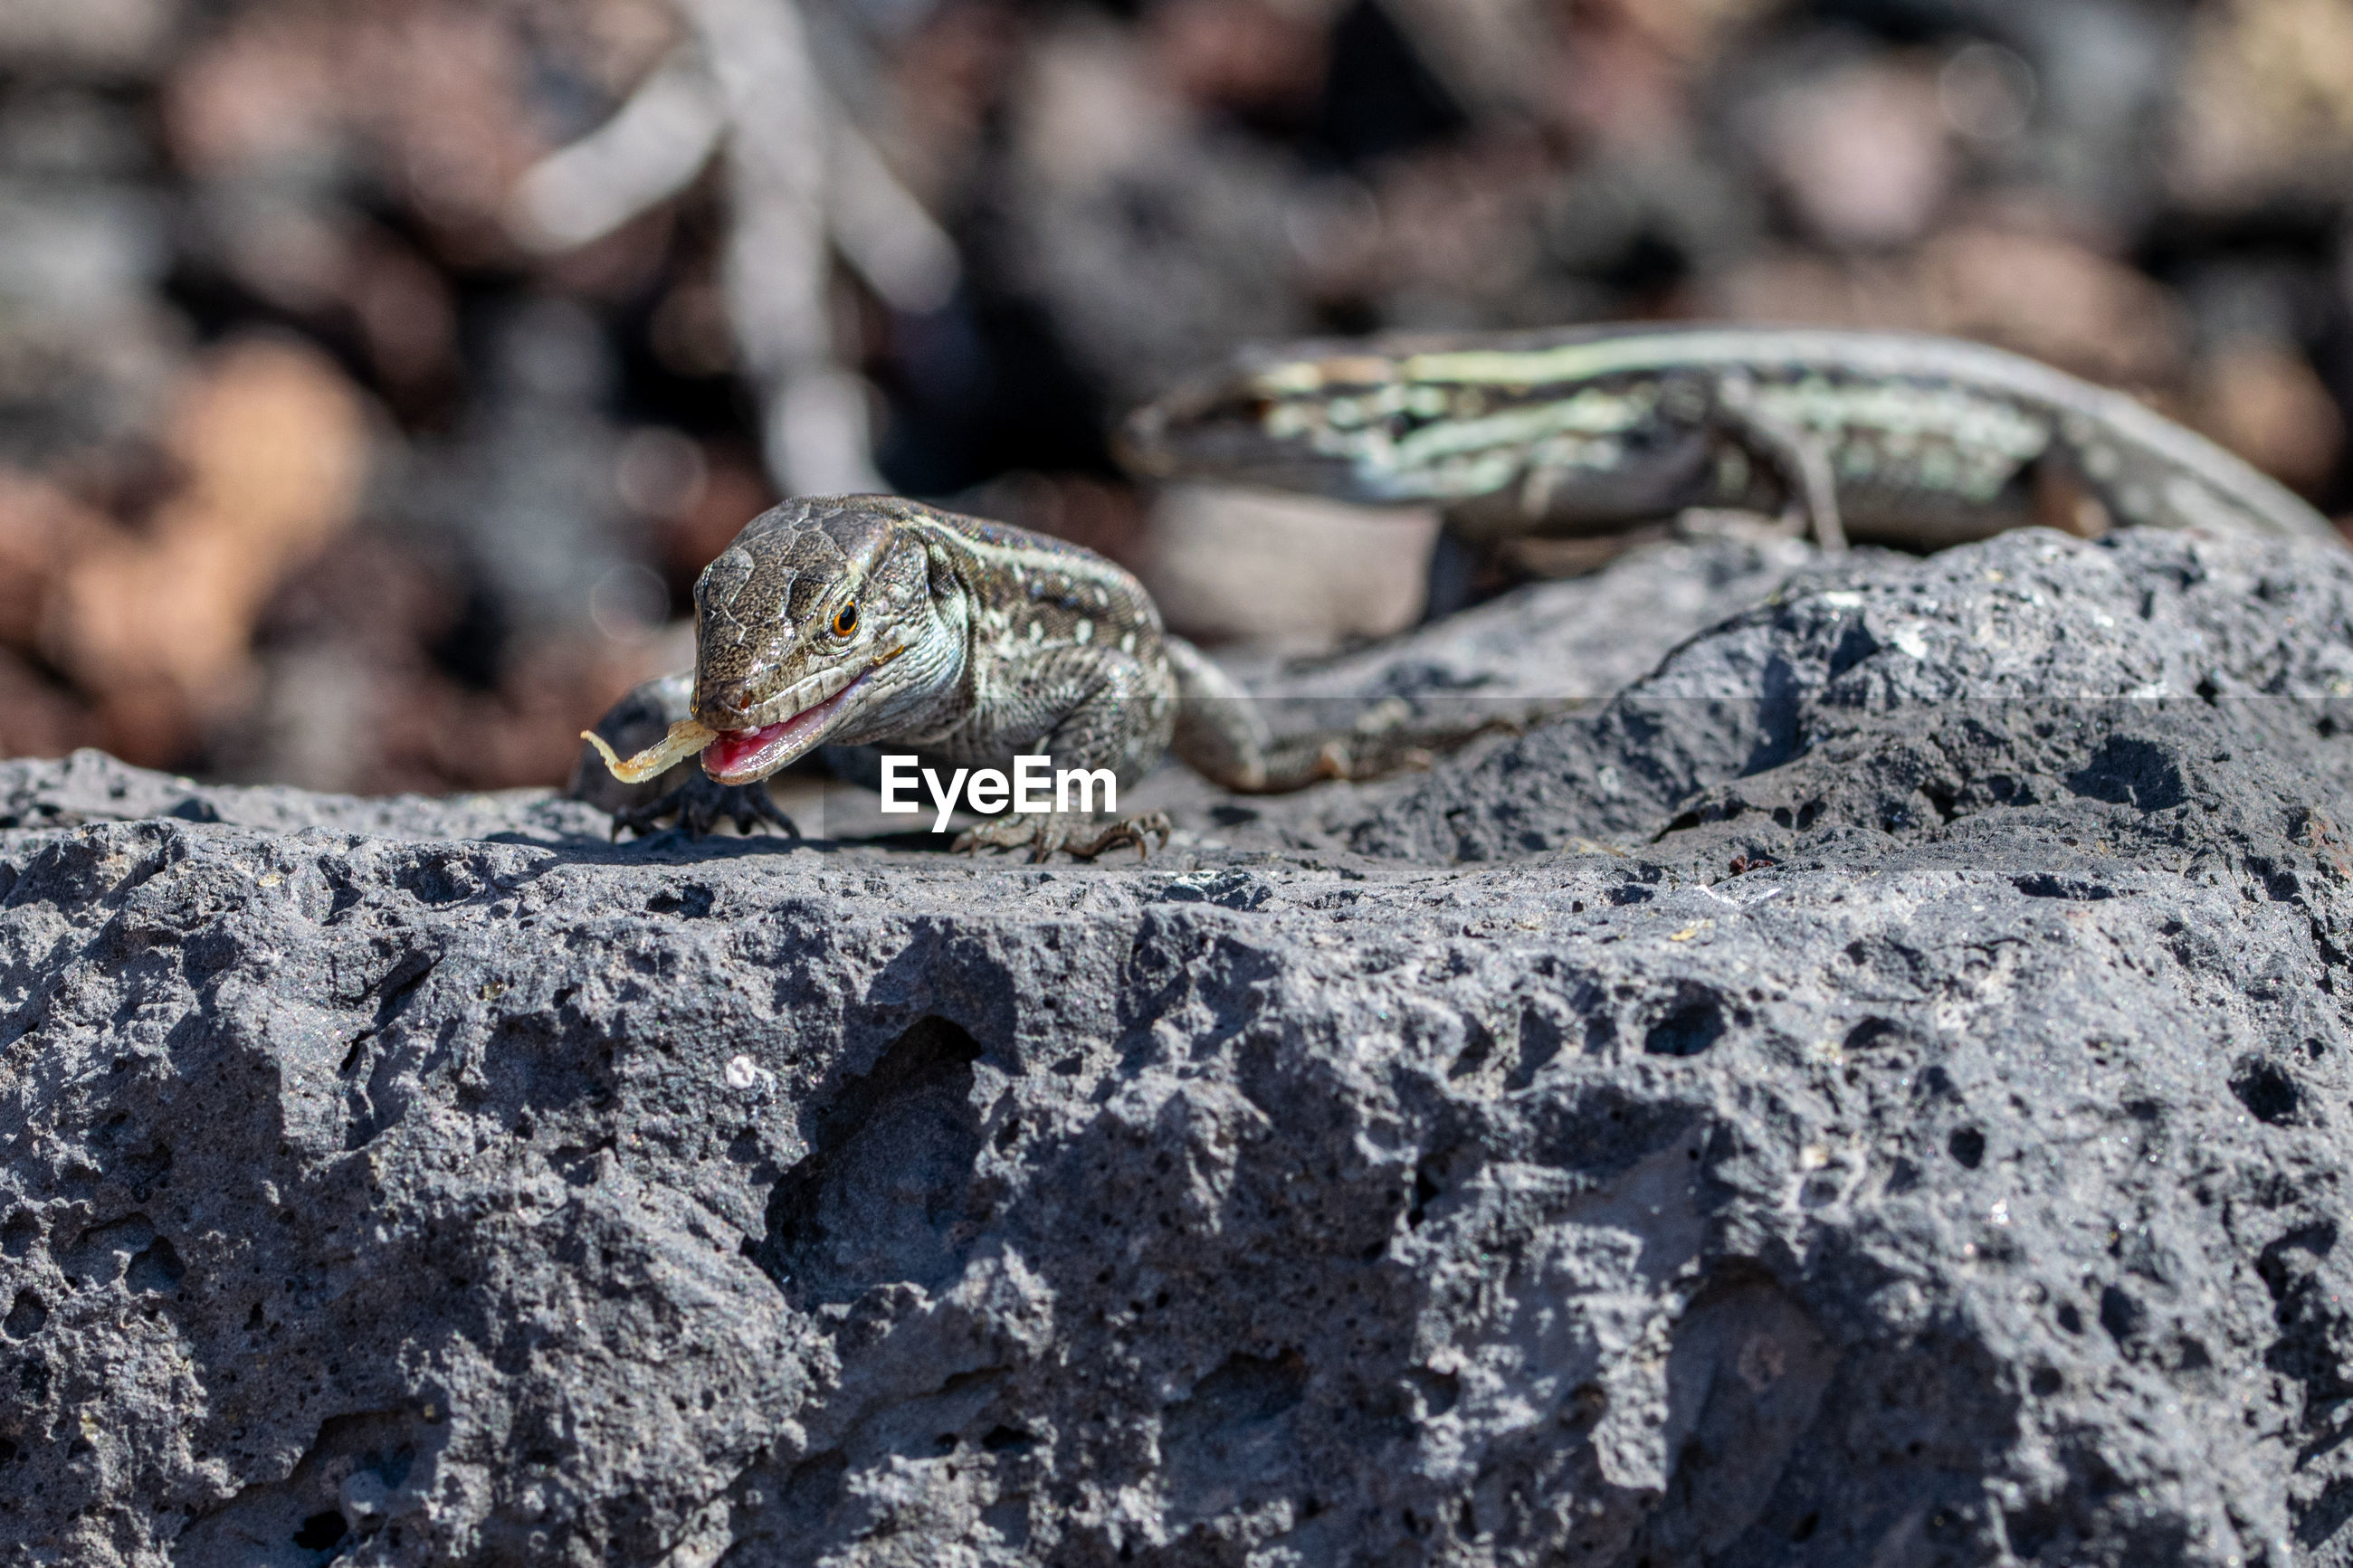 La palma wall lizards, gallotia galloti palmae, eating discarded banana on volcanic rock.